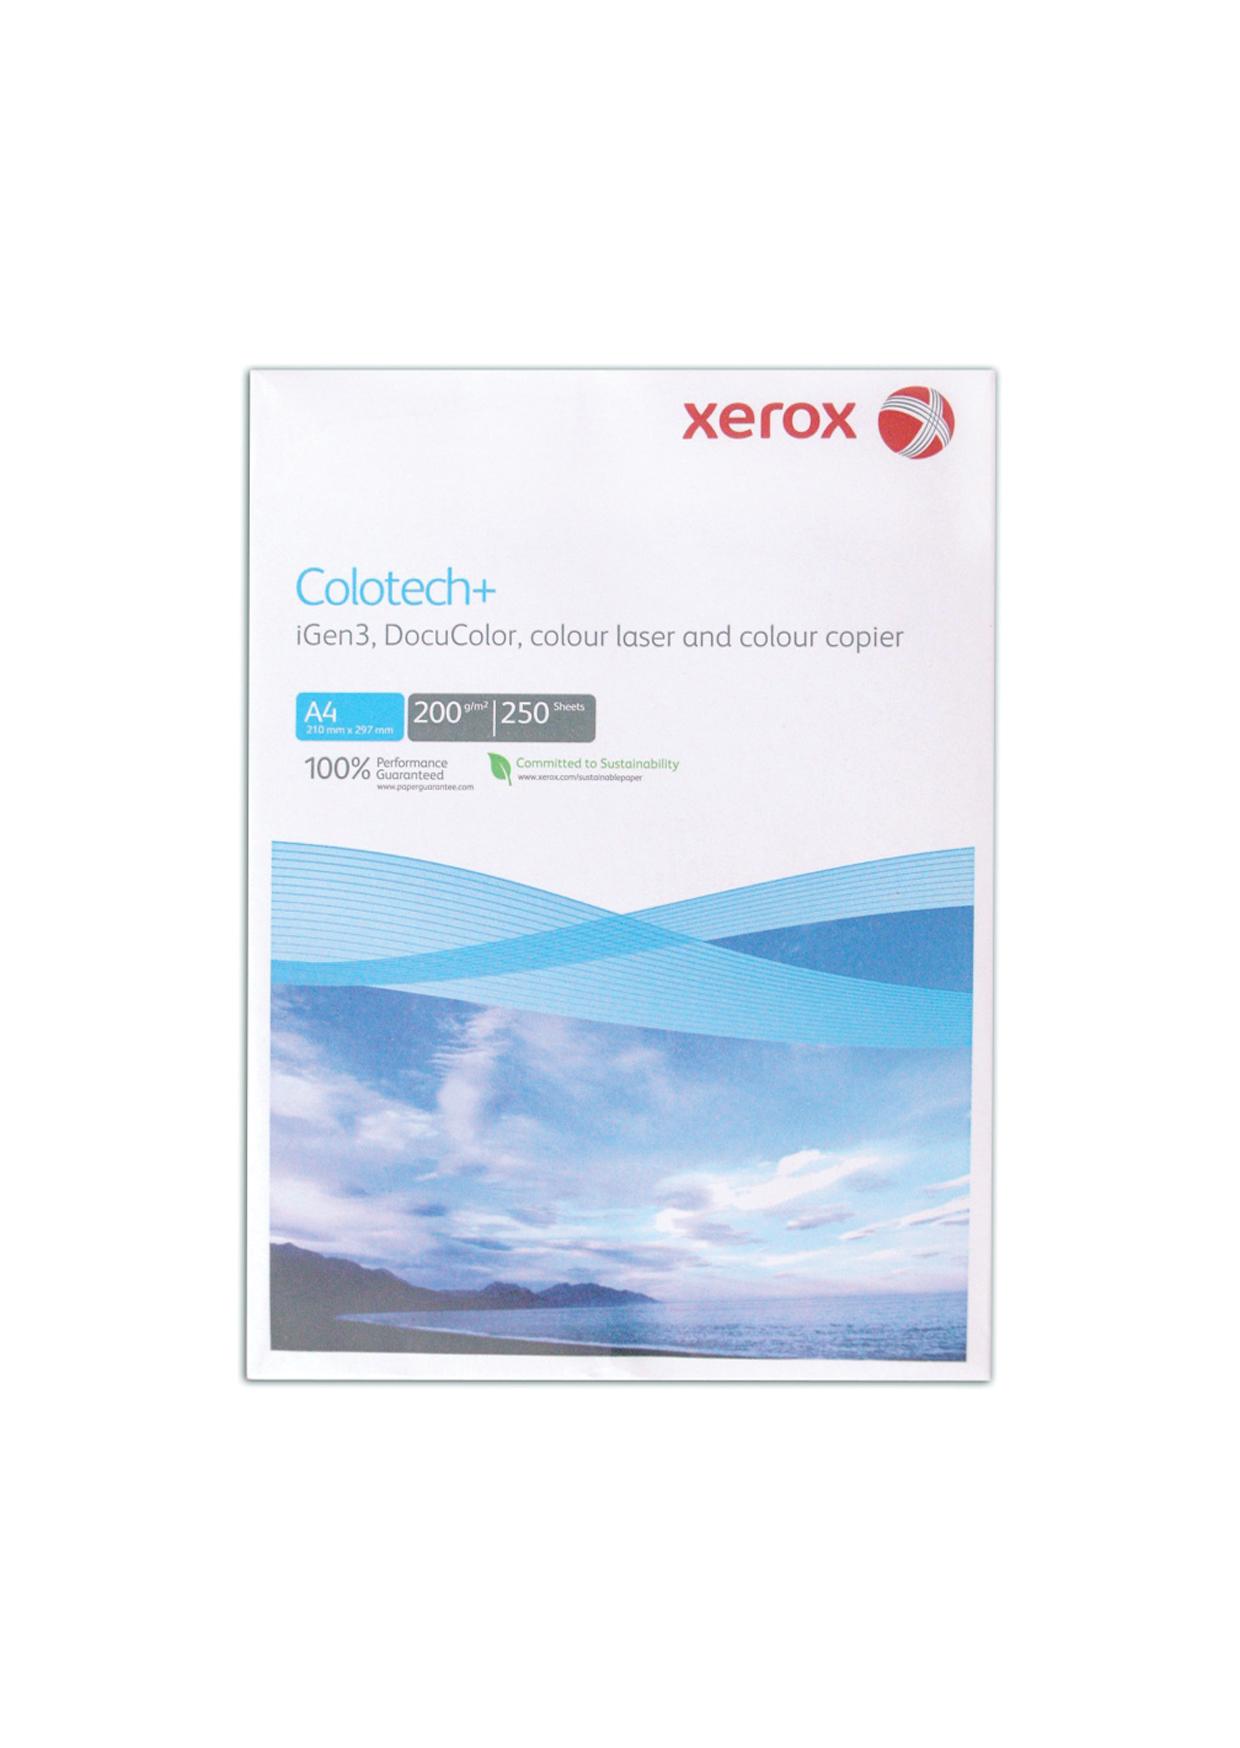 Копирна хартия Xerox Colotech+ A3 500 листа 160 CIE 90g/m2 бял